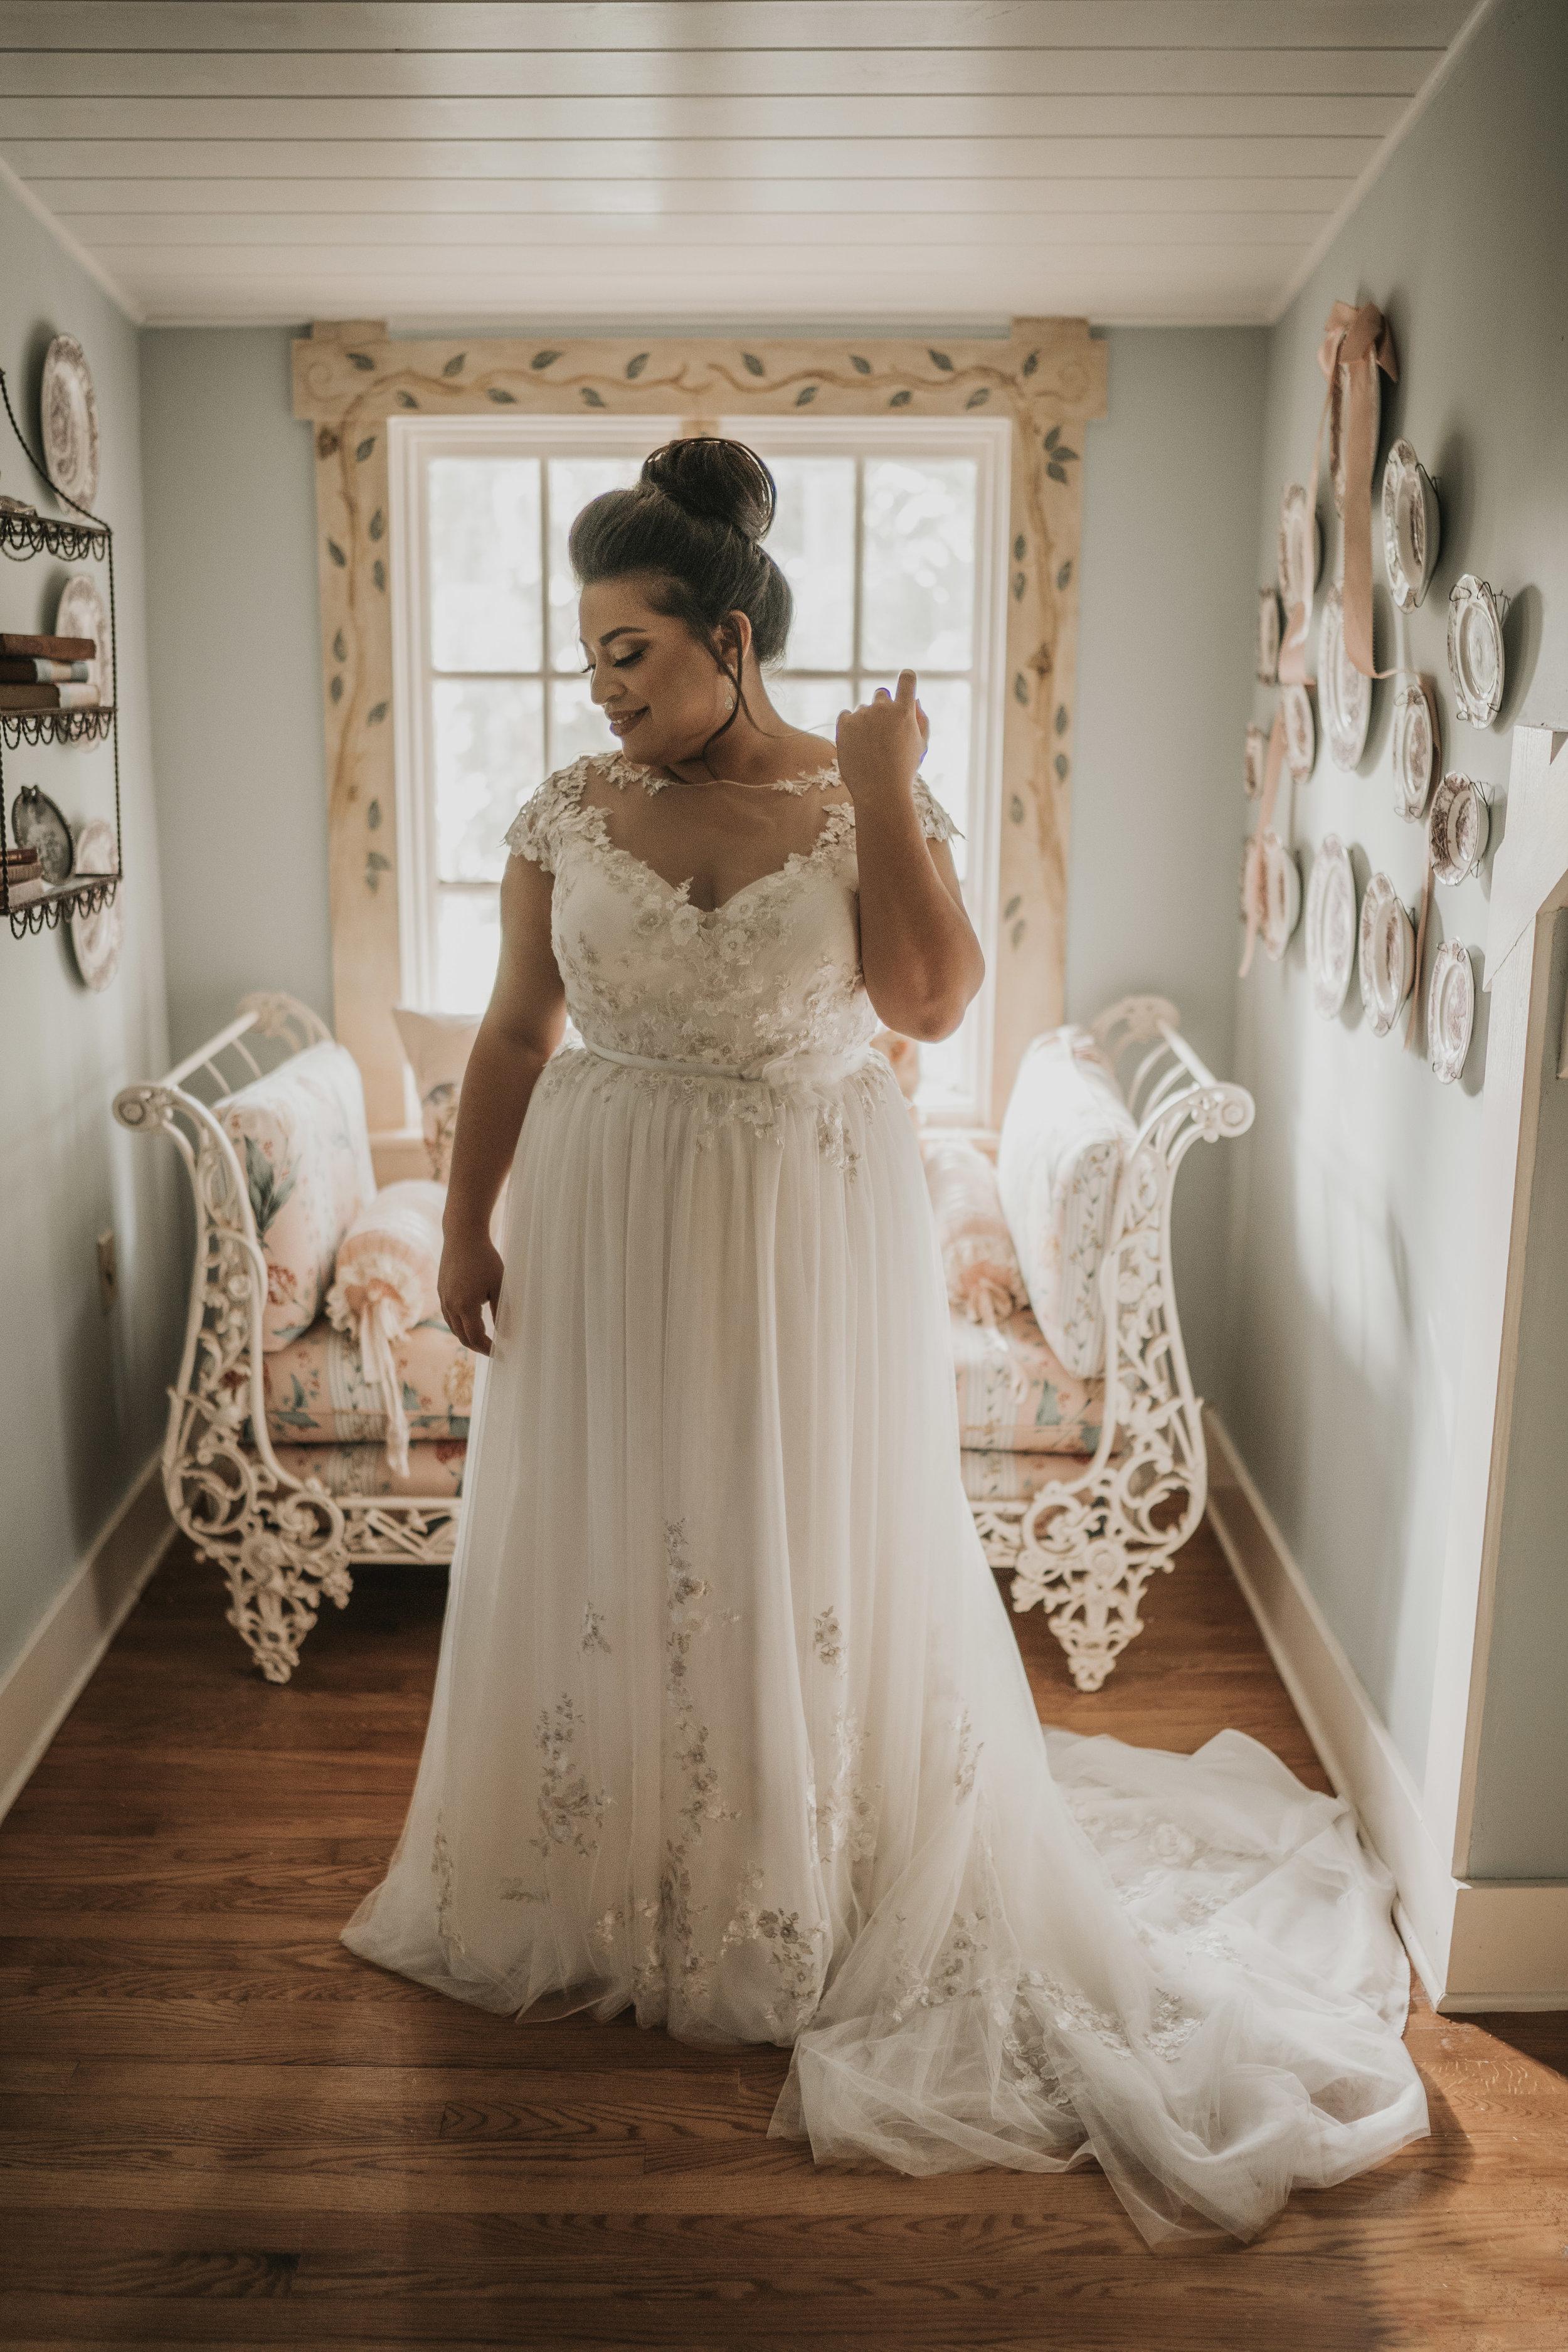 195MICHI&GABEWEDDINGDAY(WeddingFinal).jpg